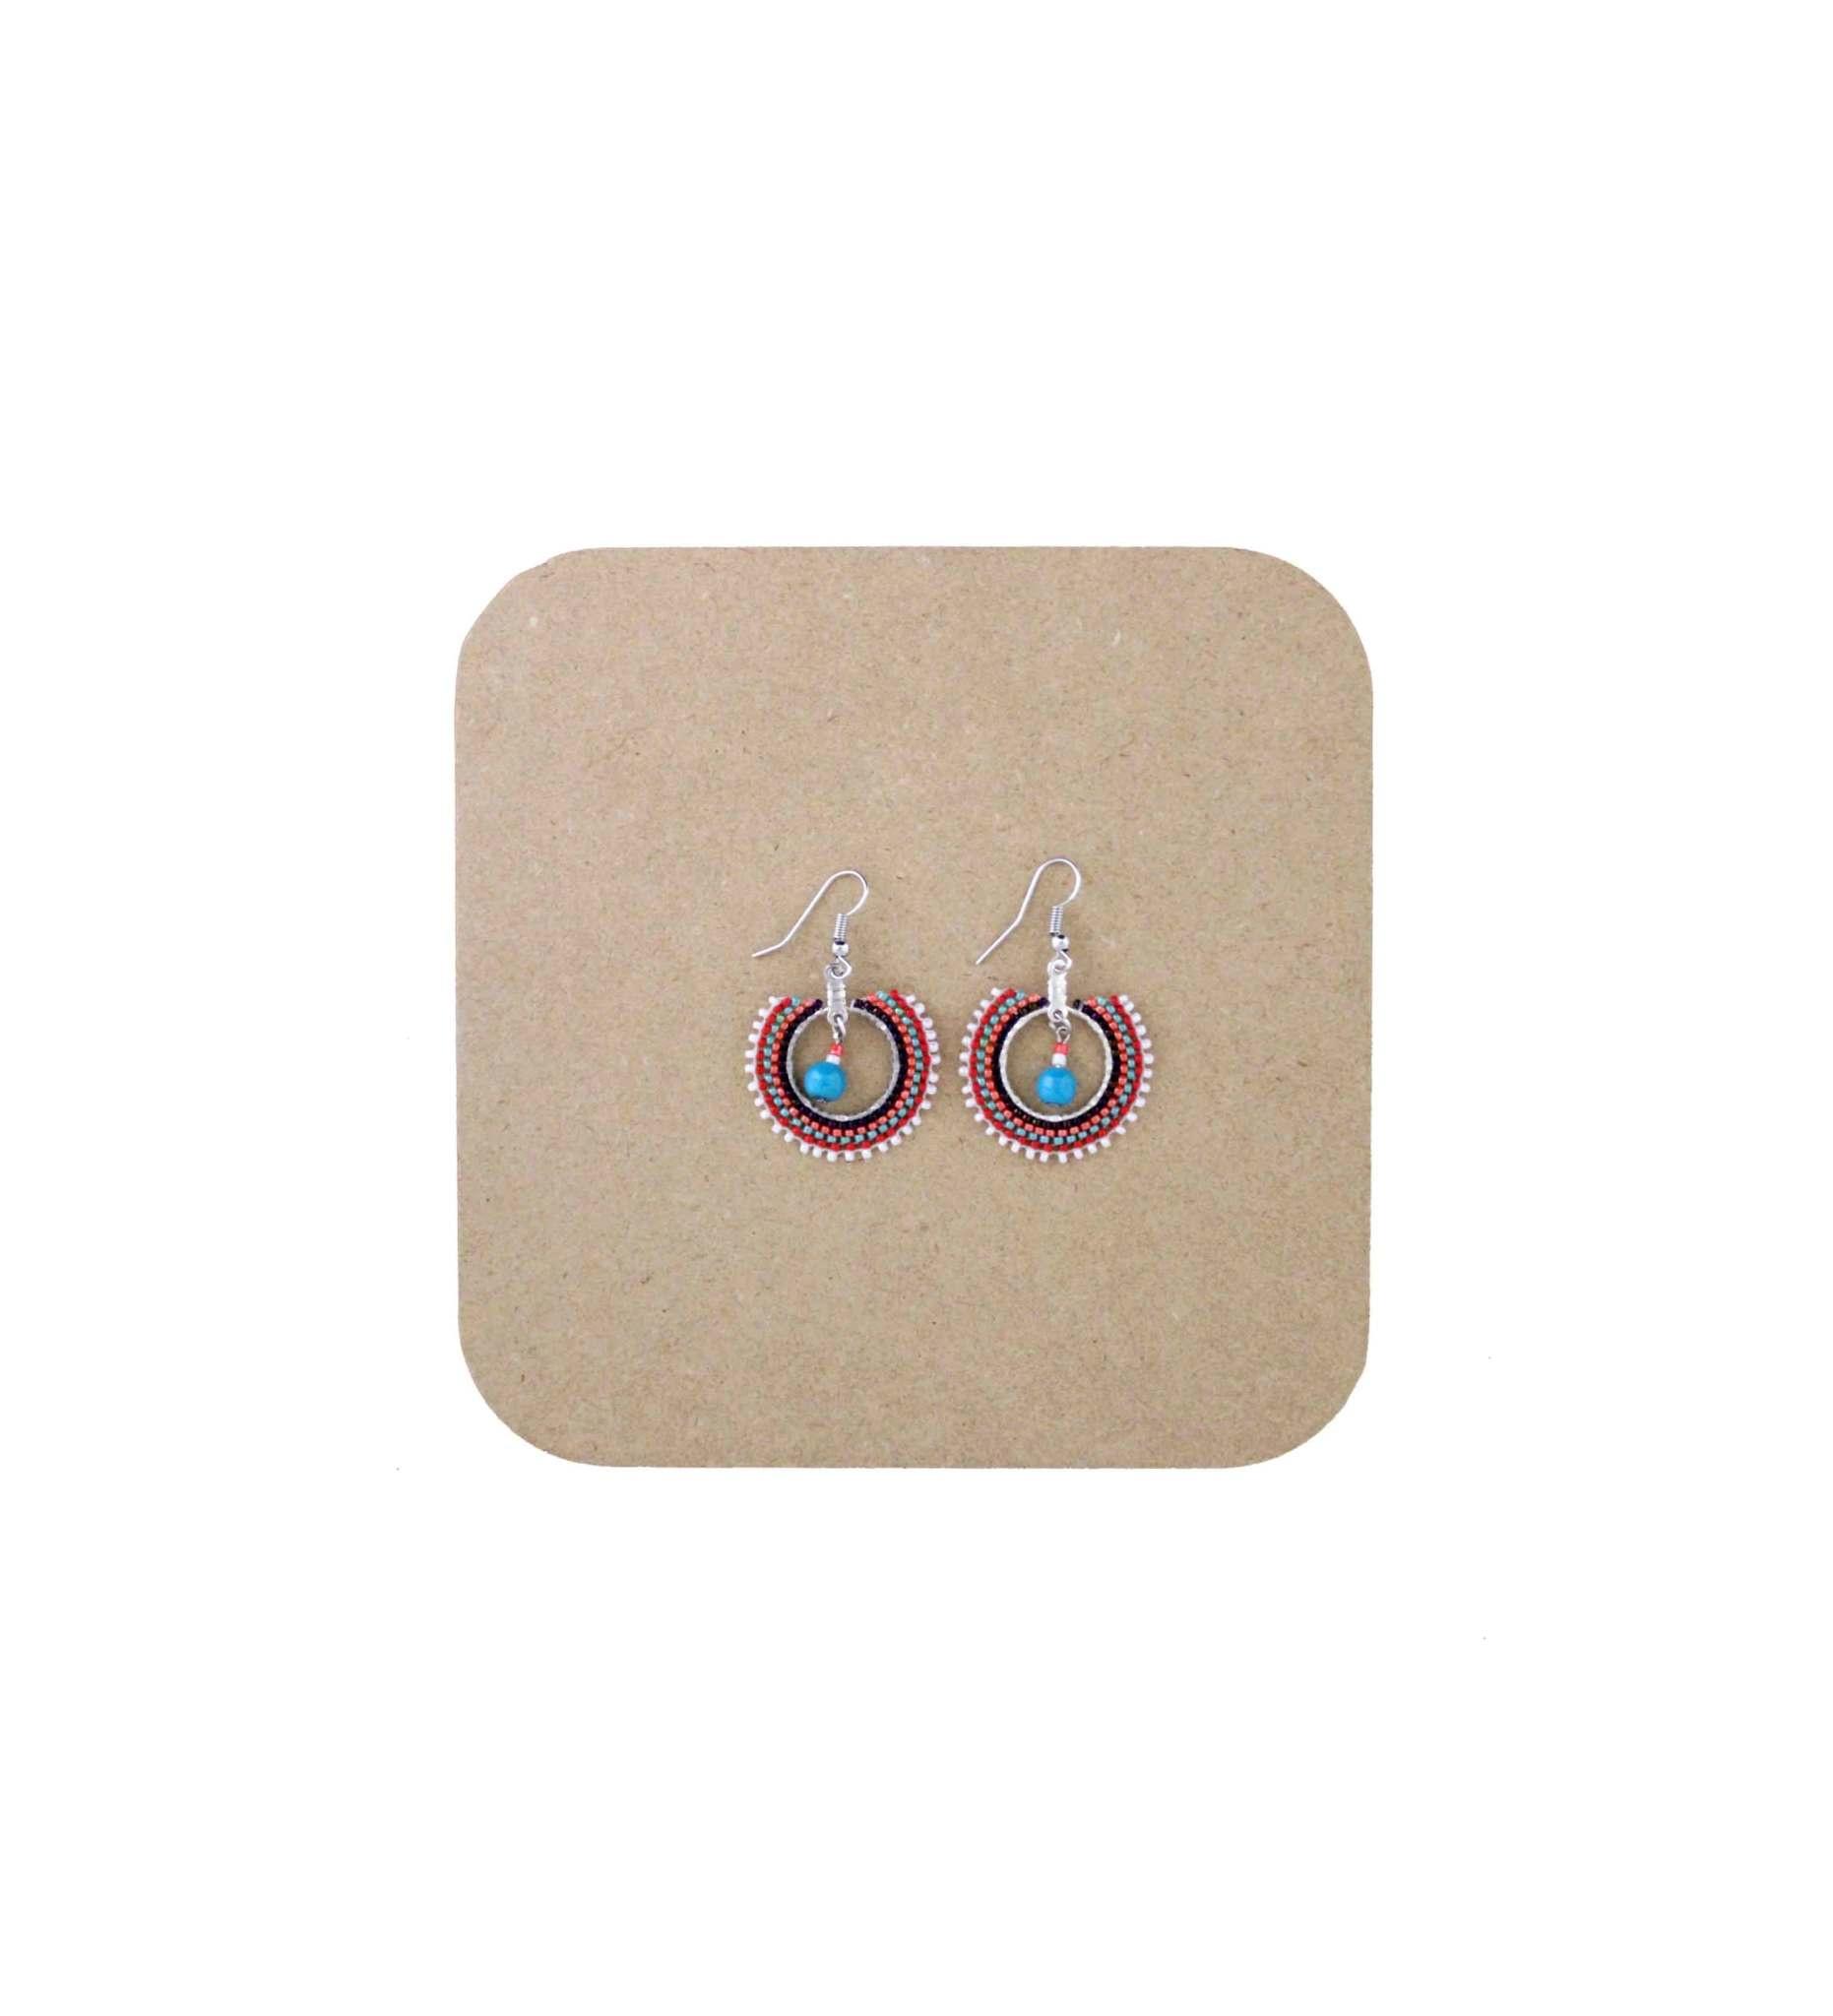 *AB 2019F Earrings